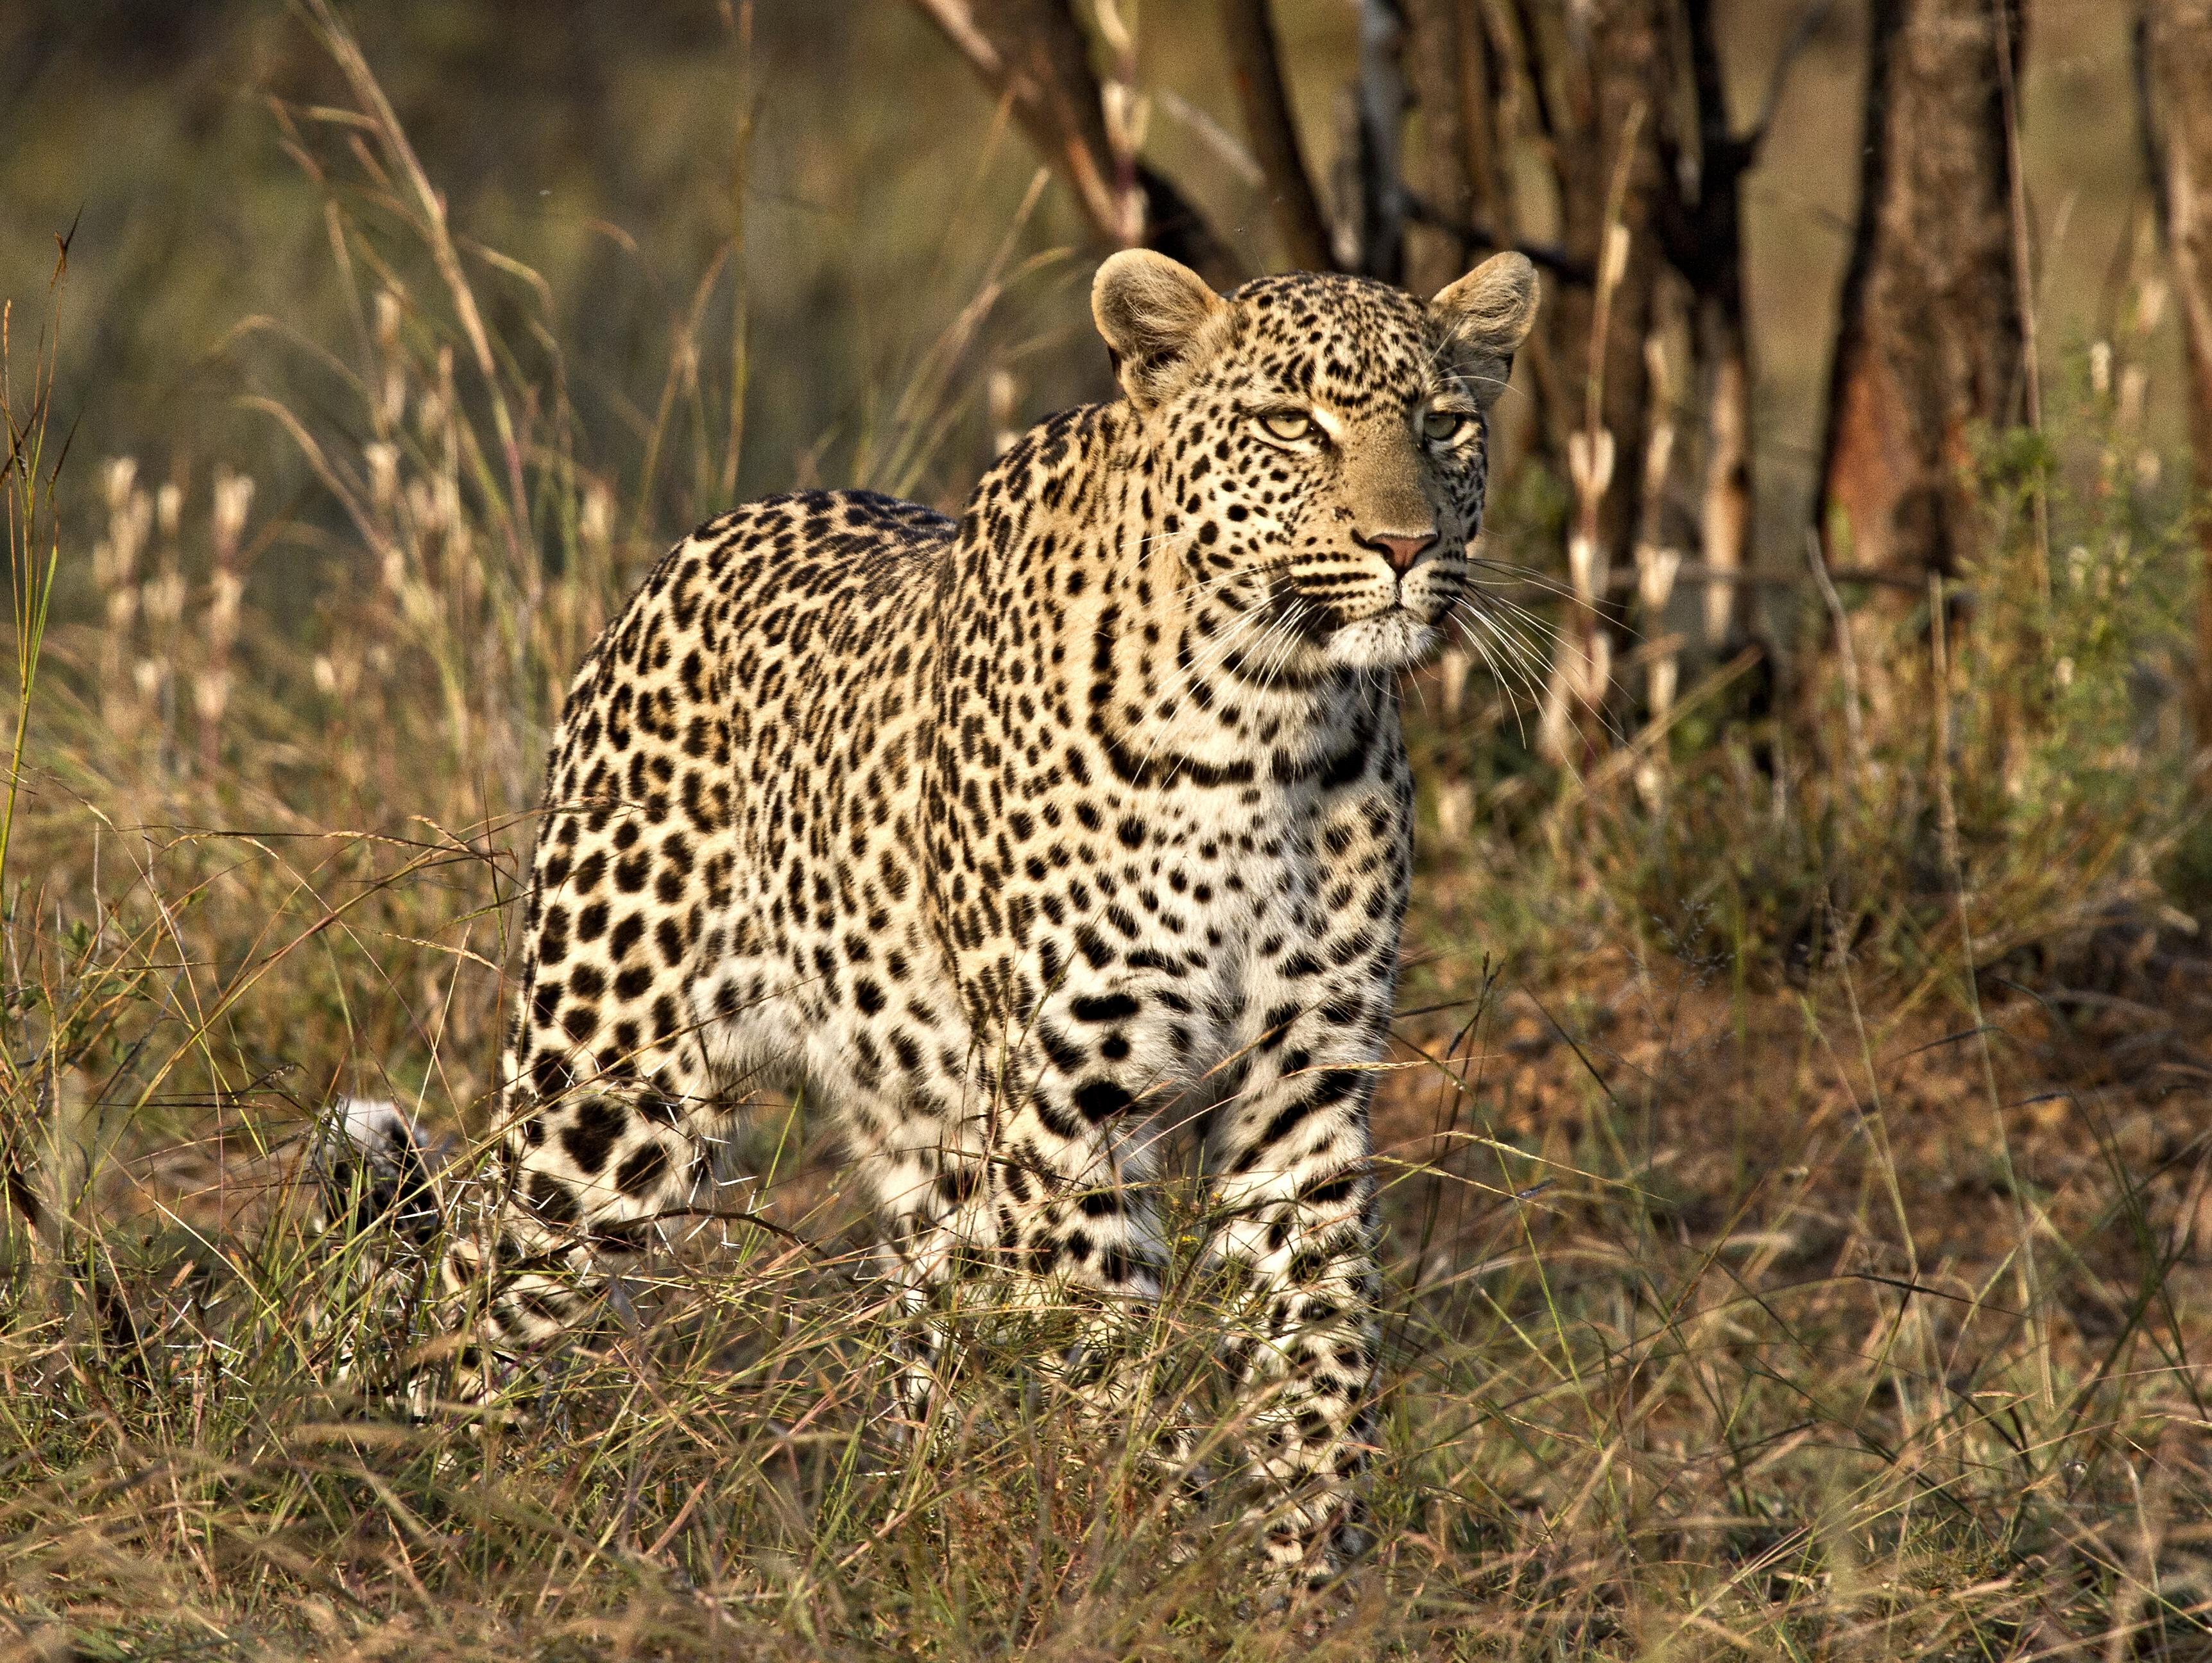 Wallpaper Leopard Bigcats Wildlife Predator Bush